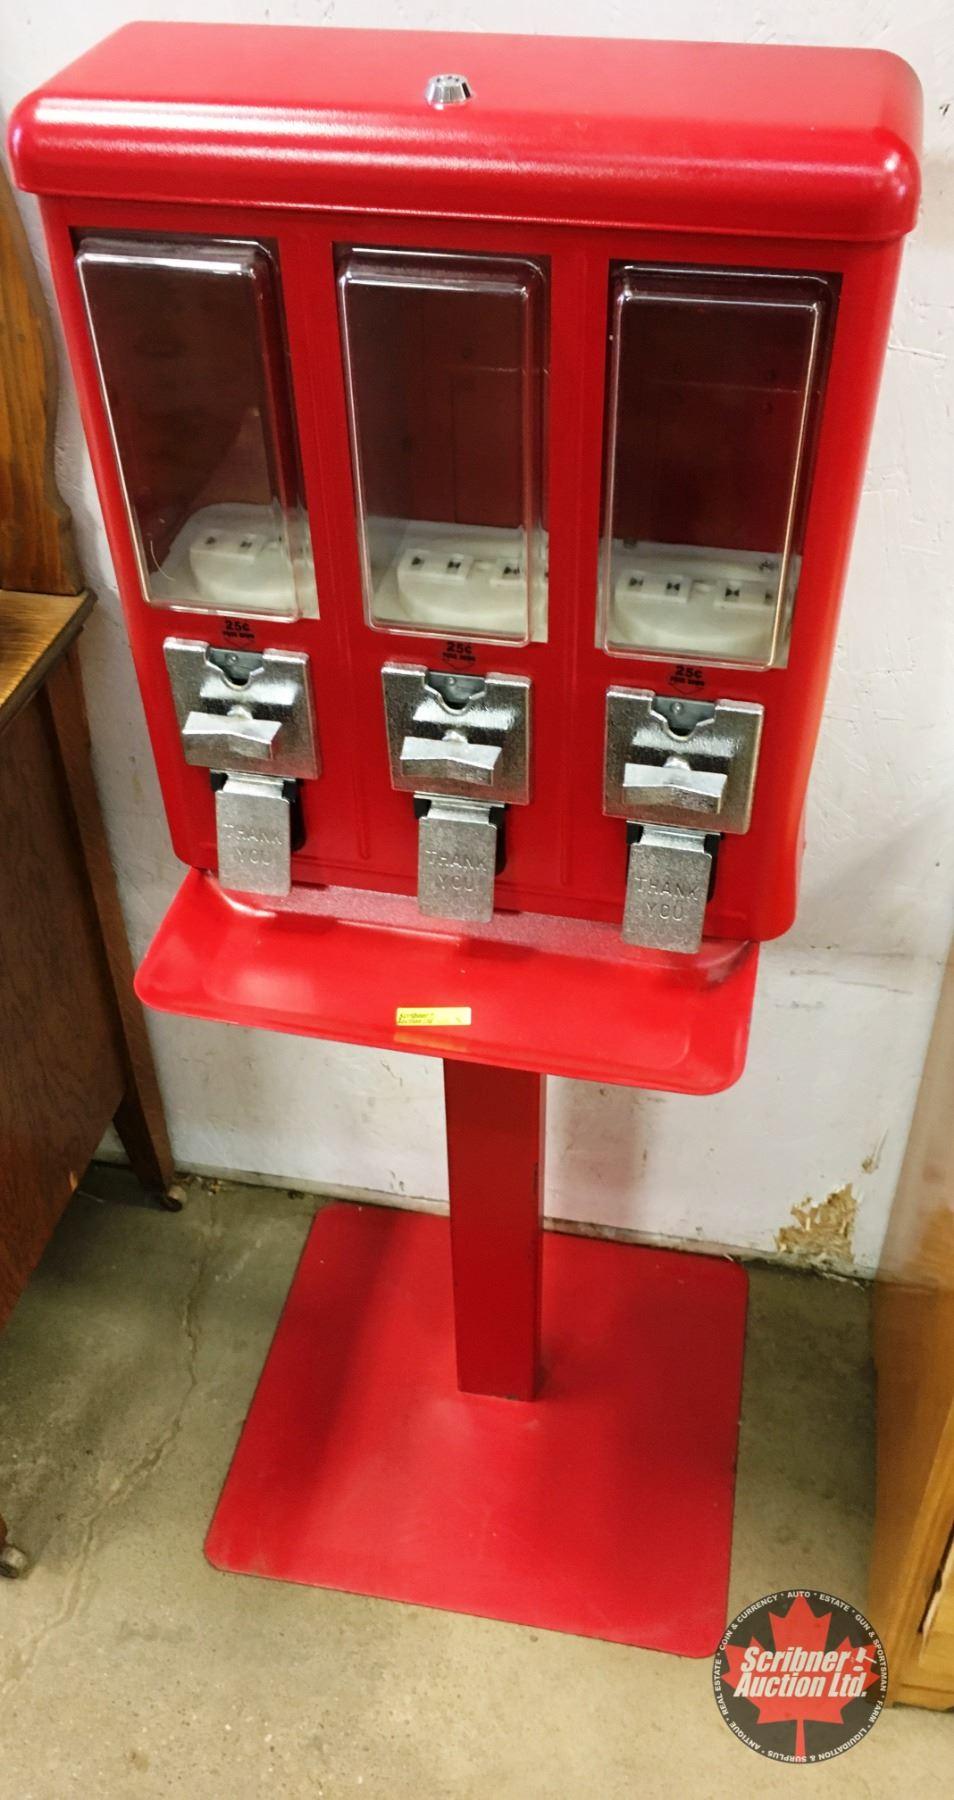 3 Slot Candy Machine